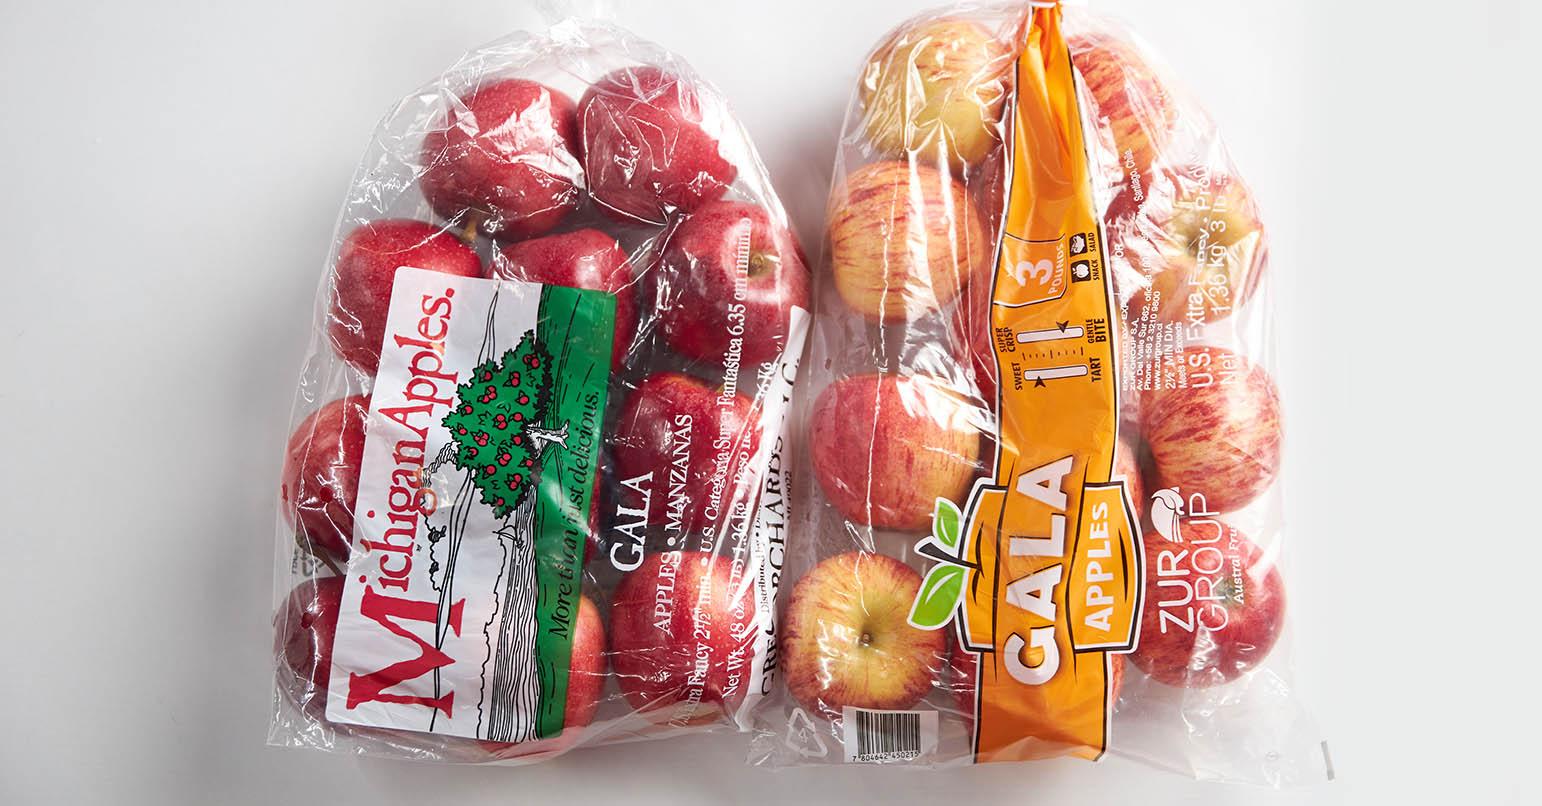 Aldi vs Walmart Apples